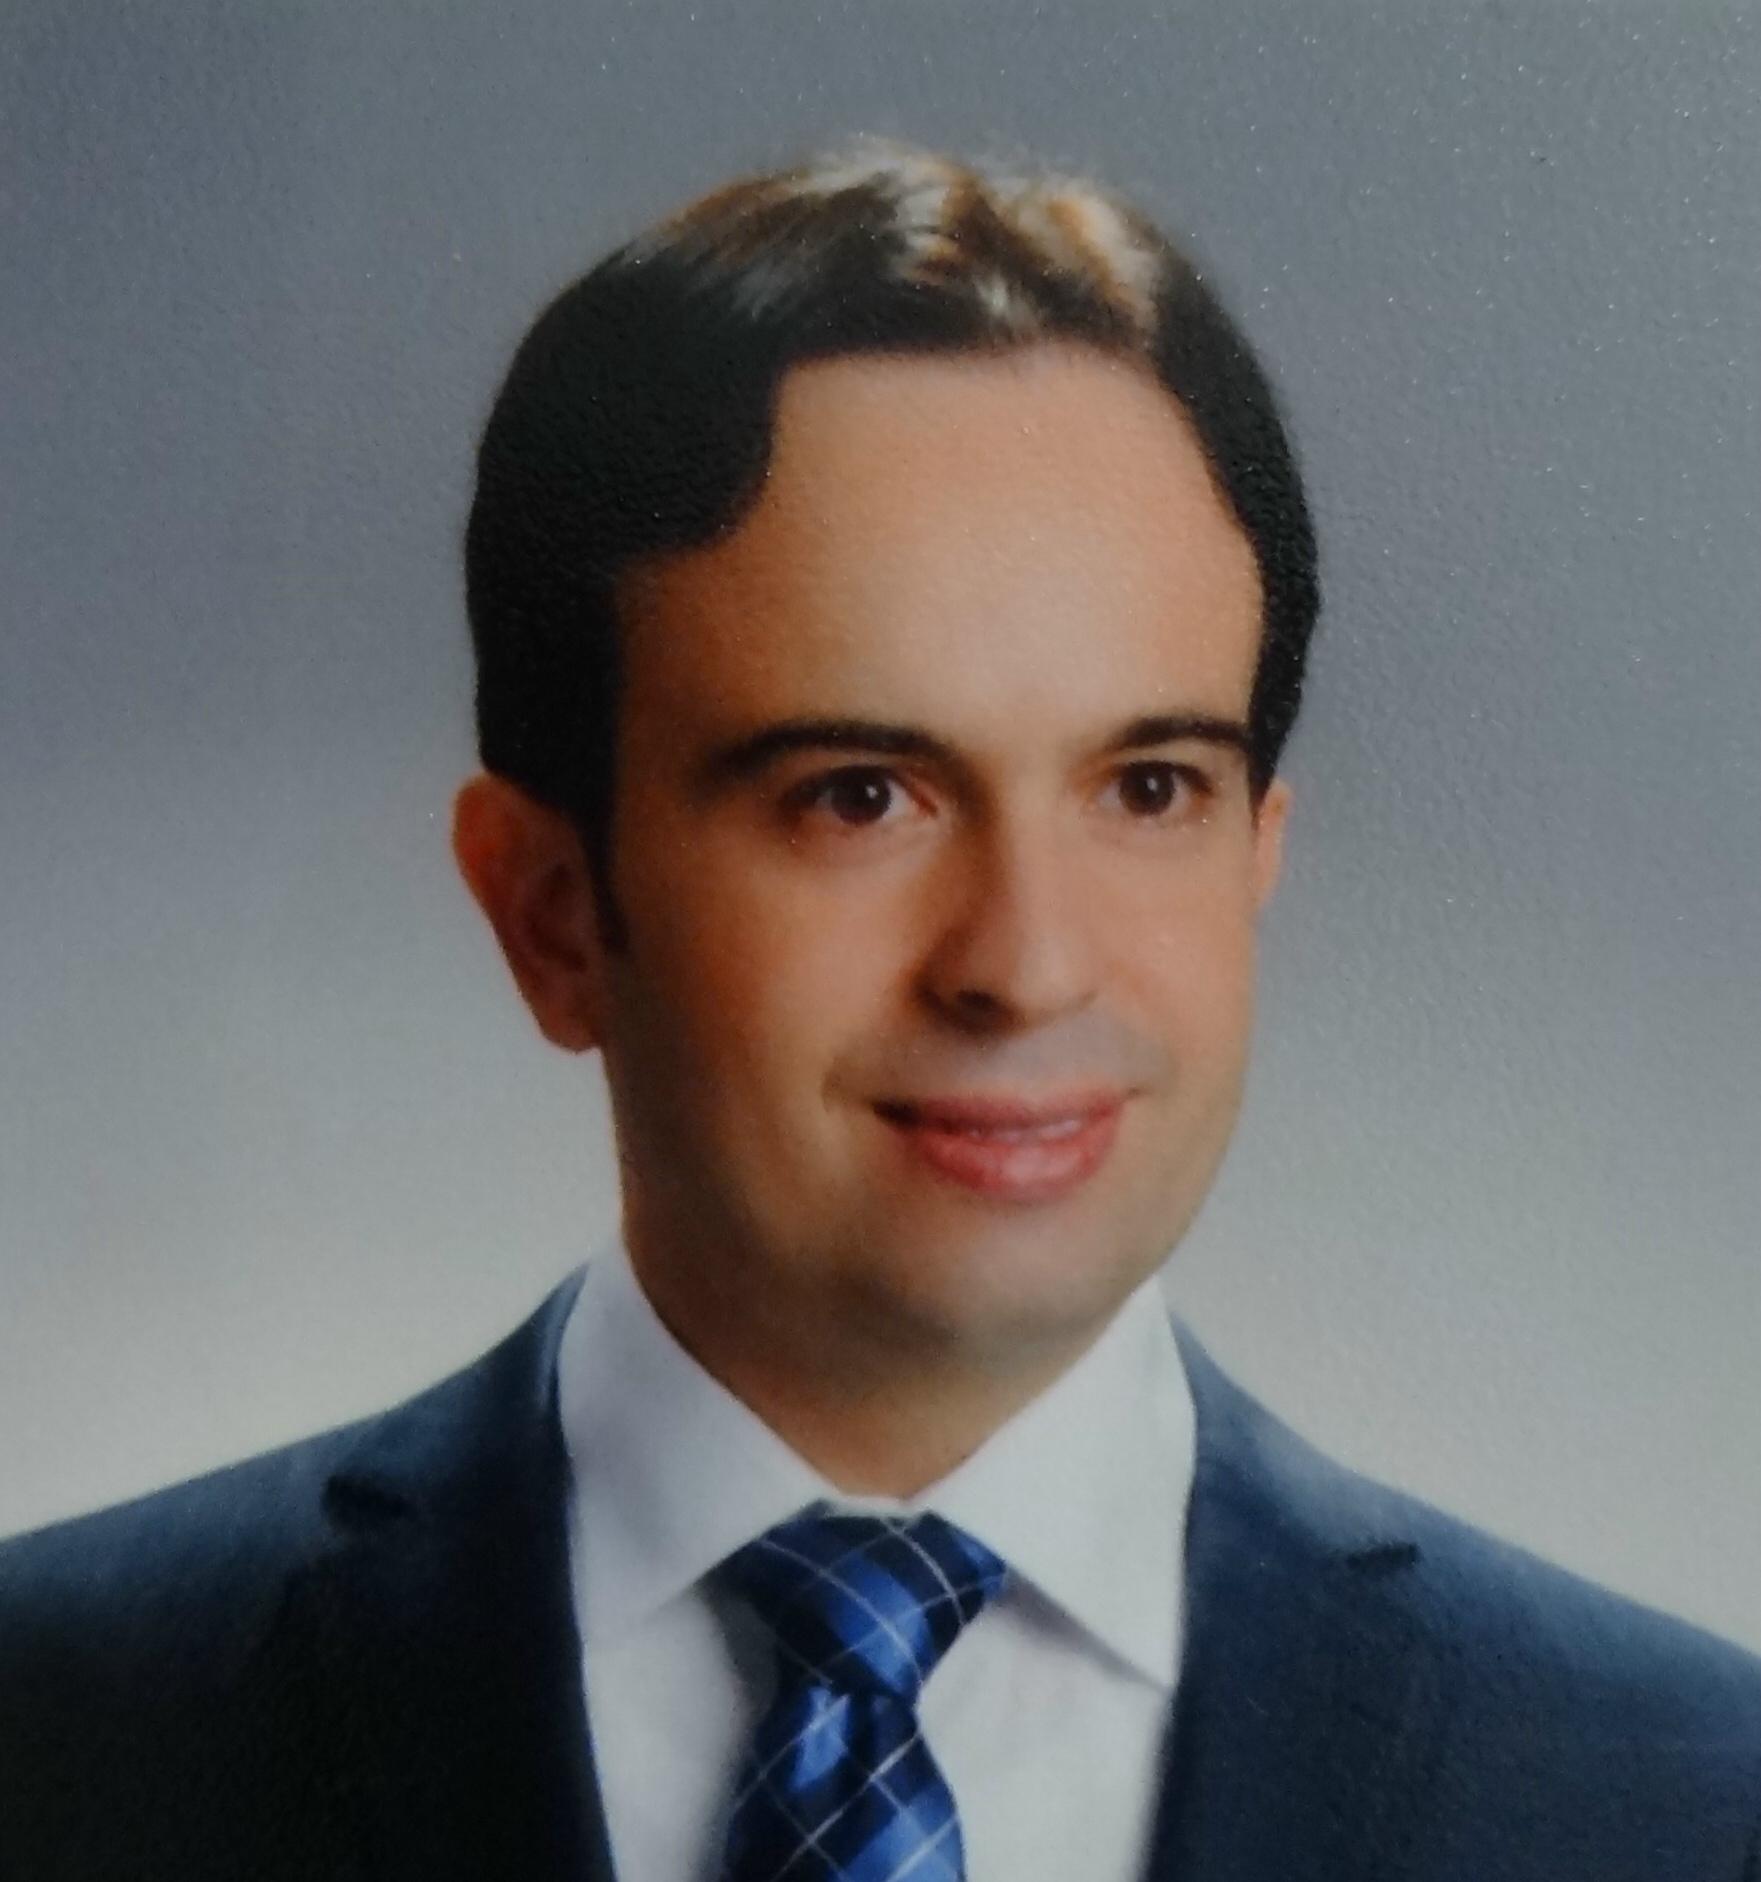 Kamil Hakan Dogan